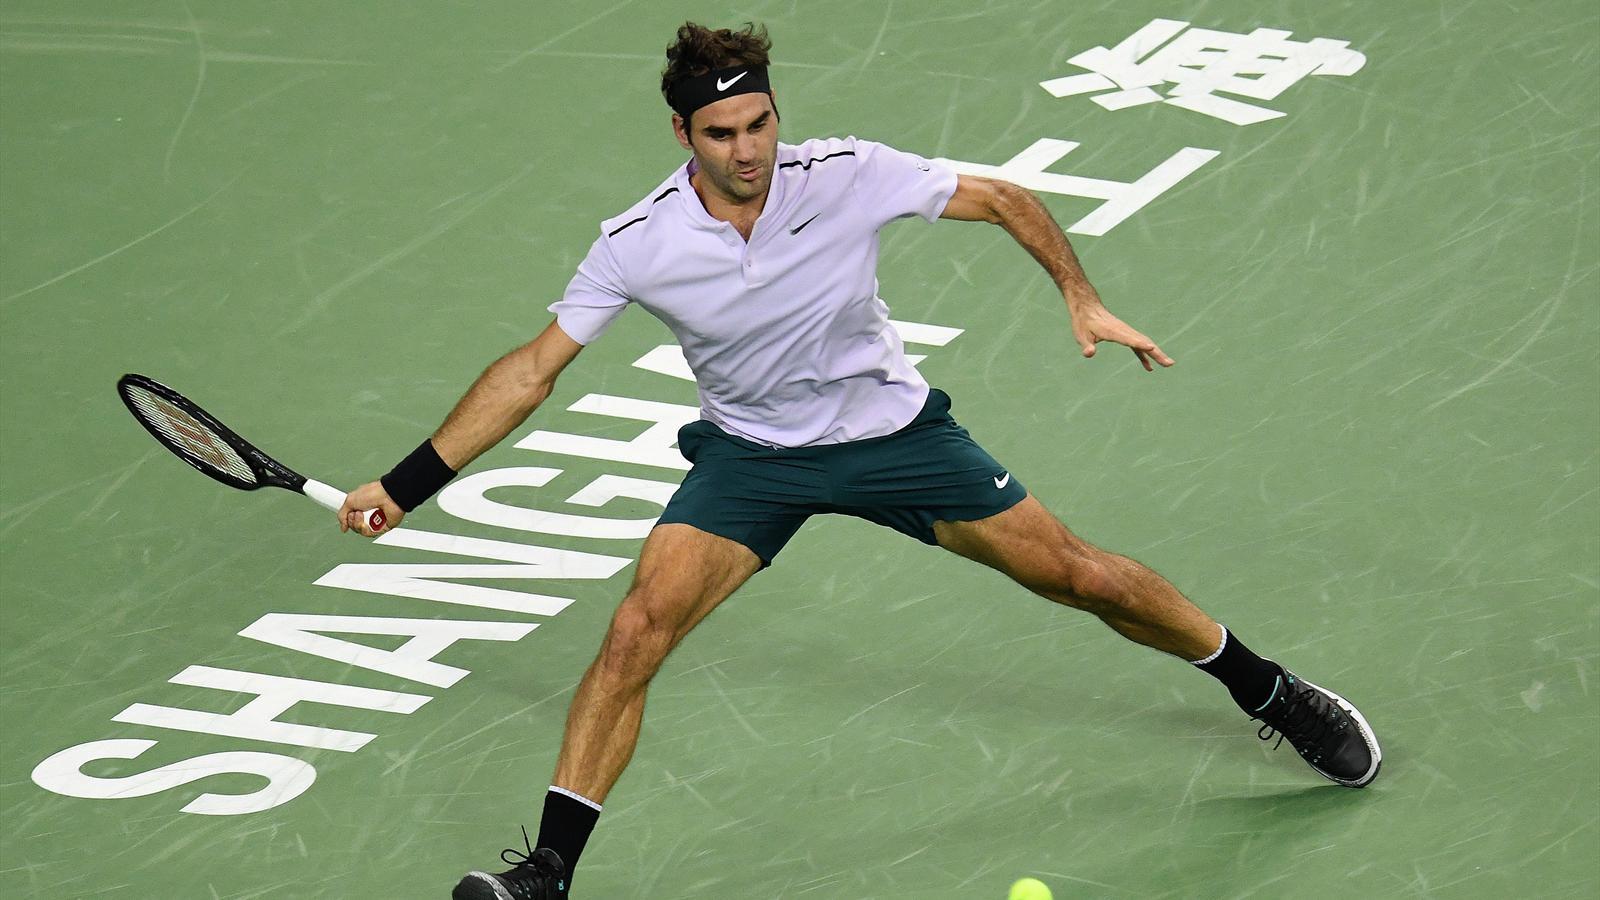 Roger Federer fatica, ma elimina Schwartzman in due set